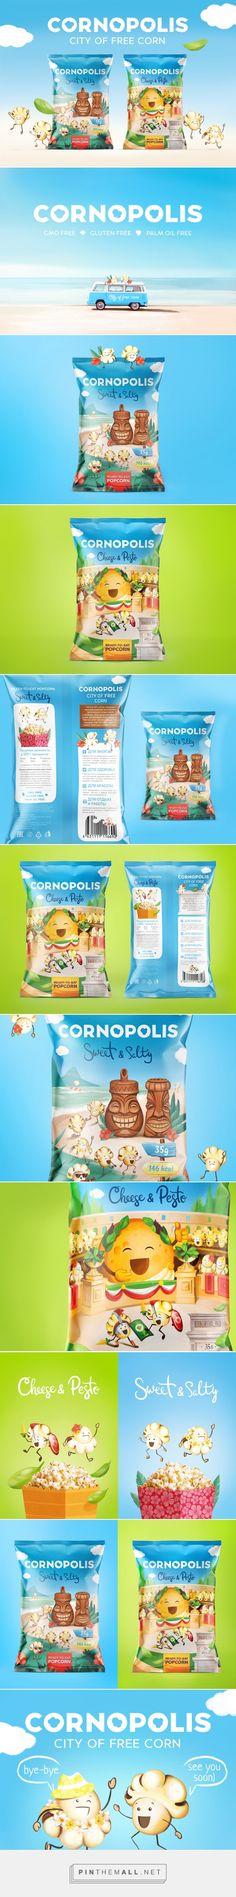 Cornopolis Popcorn - Packaging of the World - Creative Package Design Gallery - http://www.packagingoftheworld.com/2017/03/cornopolis.html